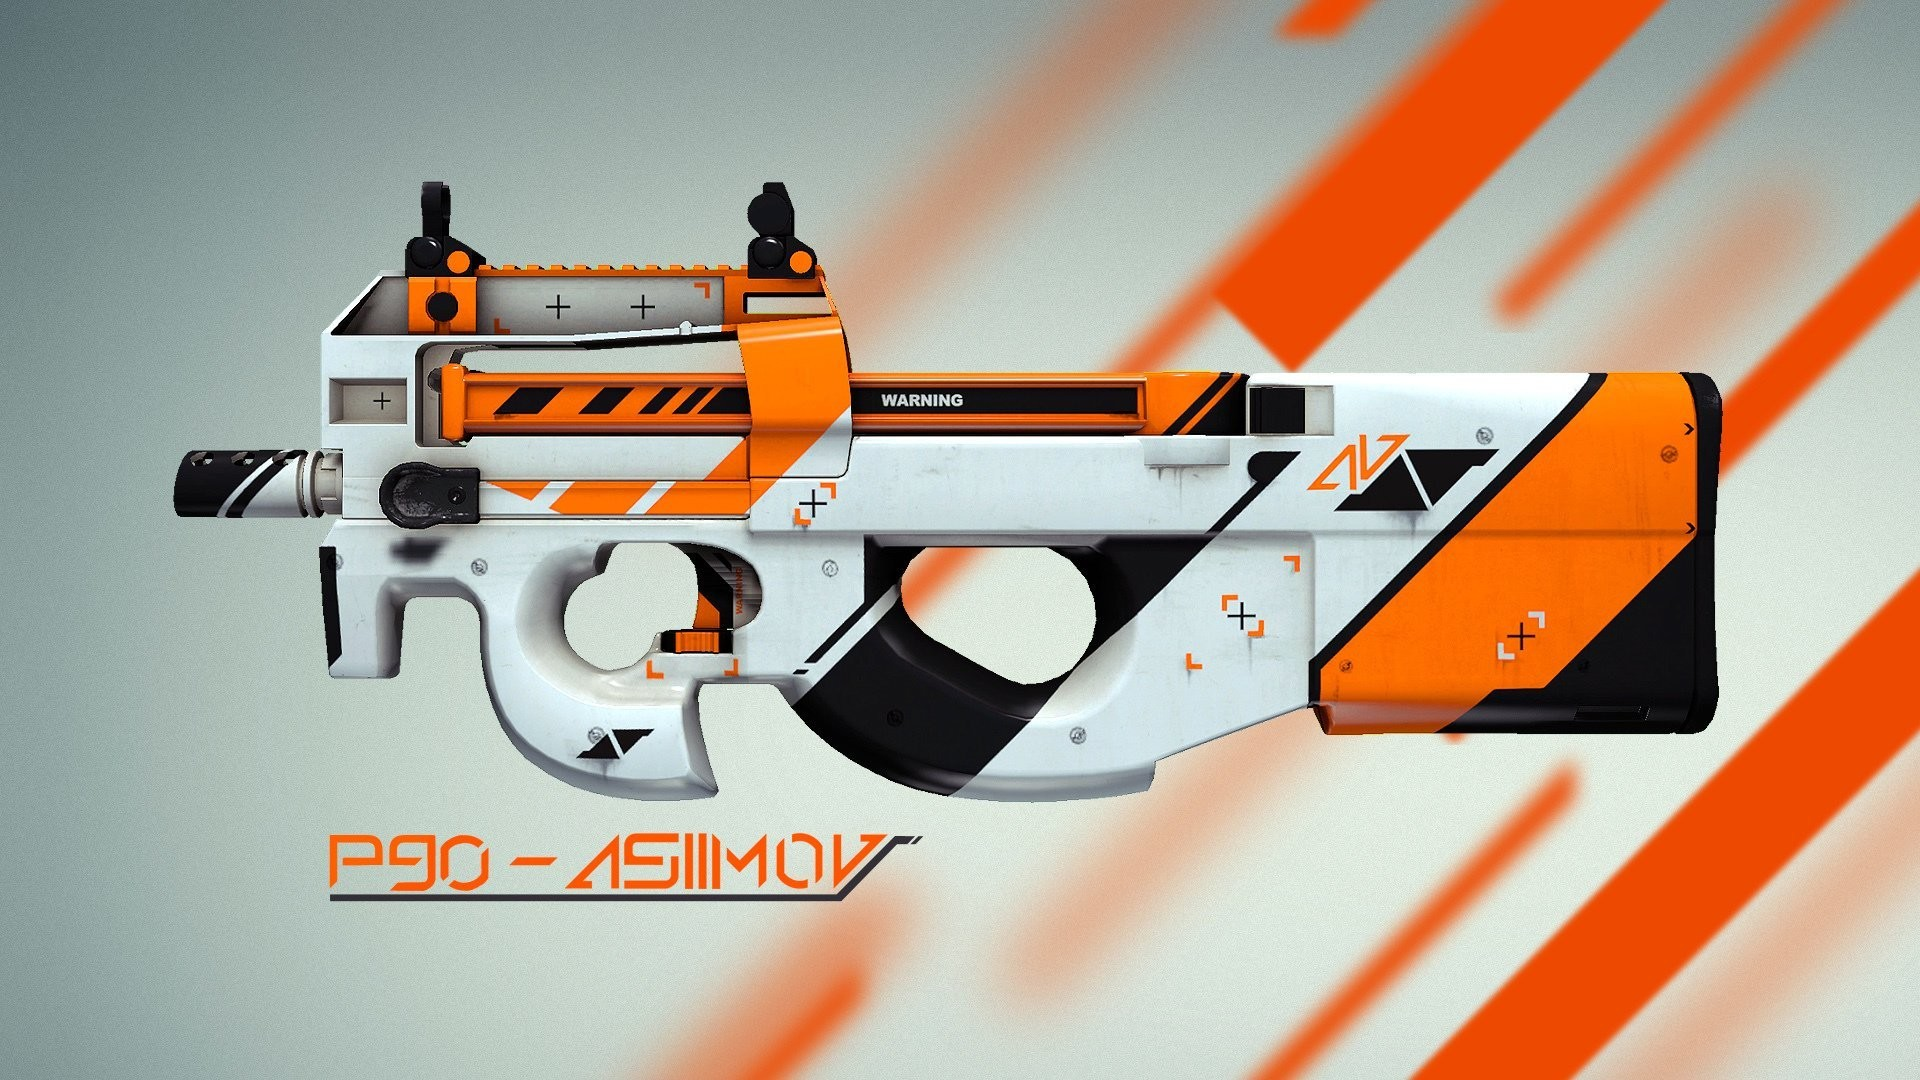 p90 asiimov cs:go counter strike global offensive skin